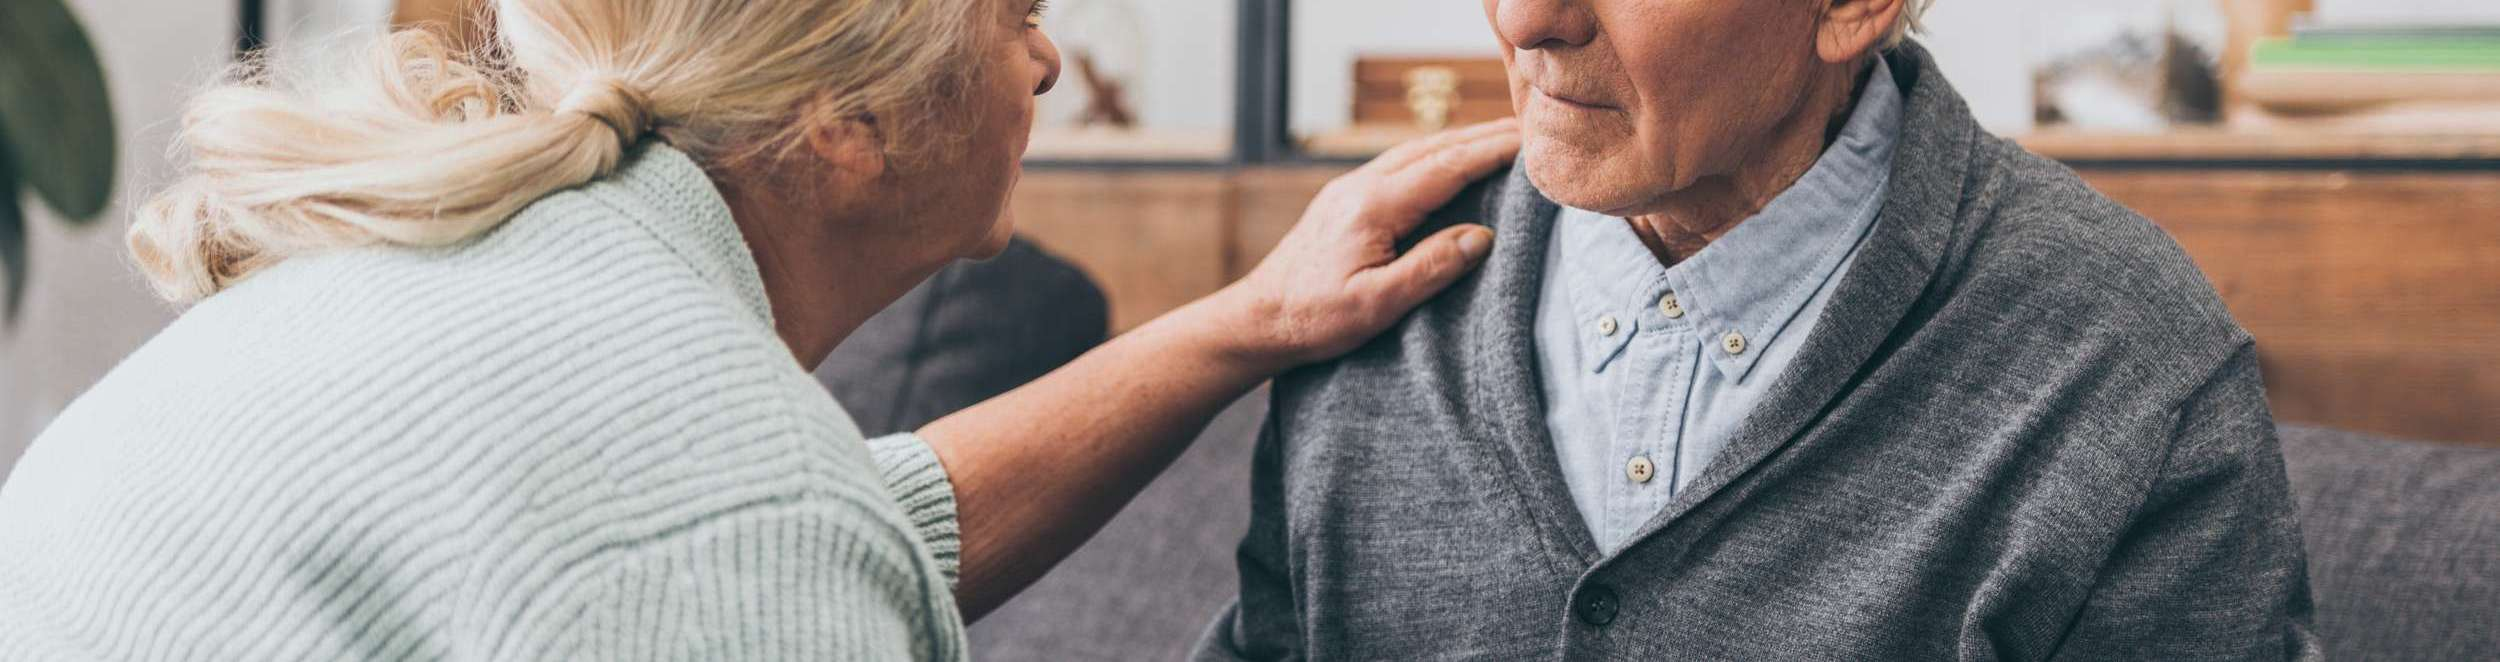 comforting elderly man